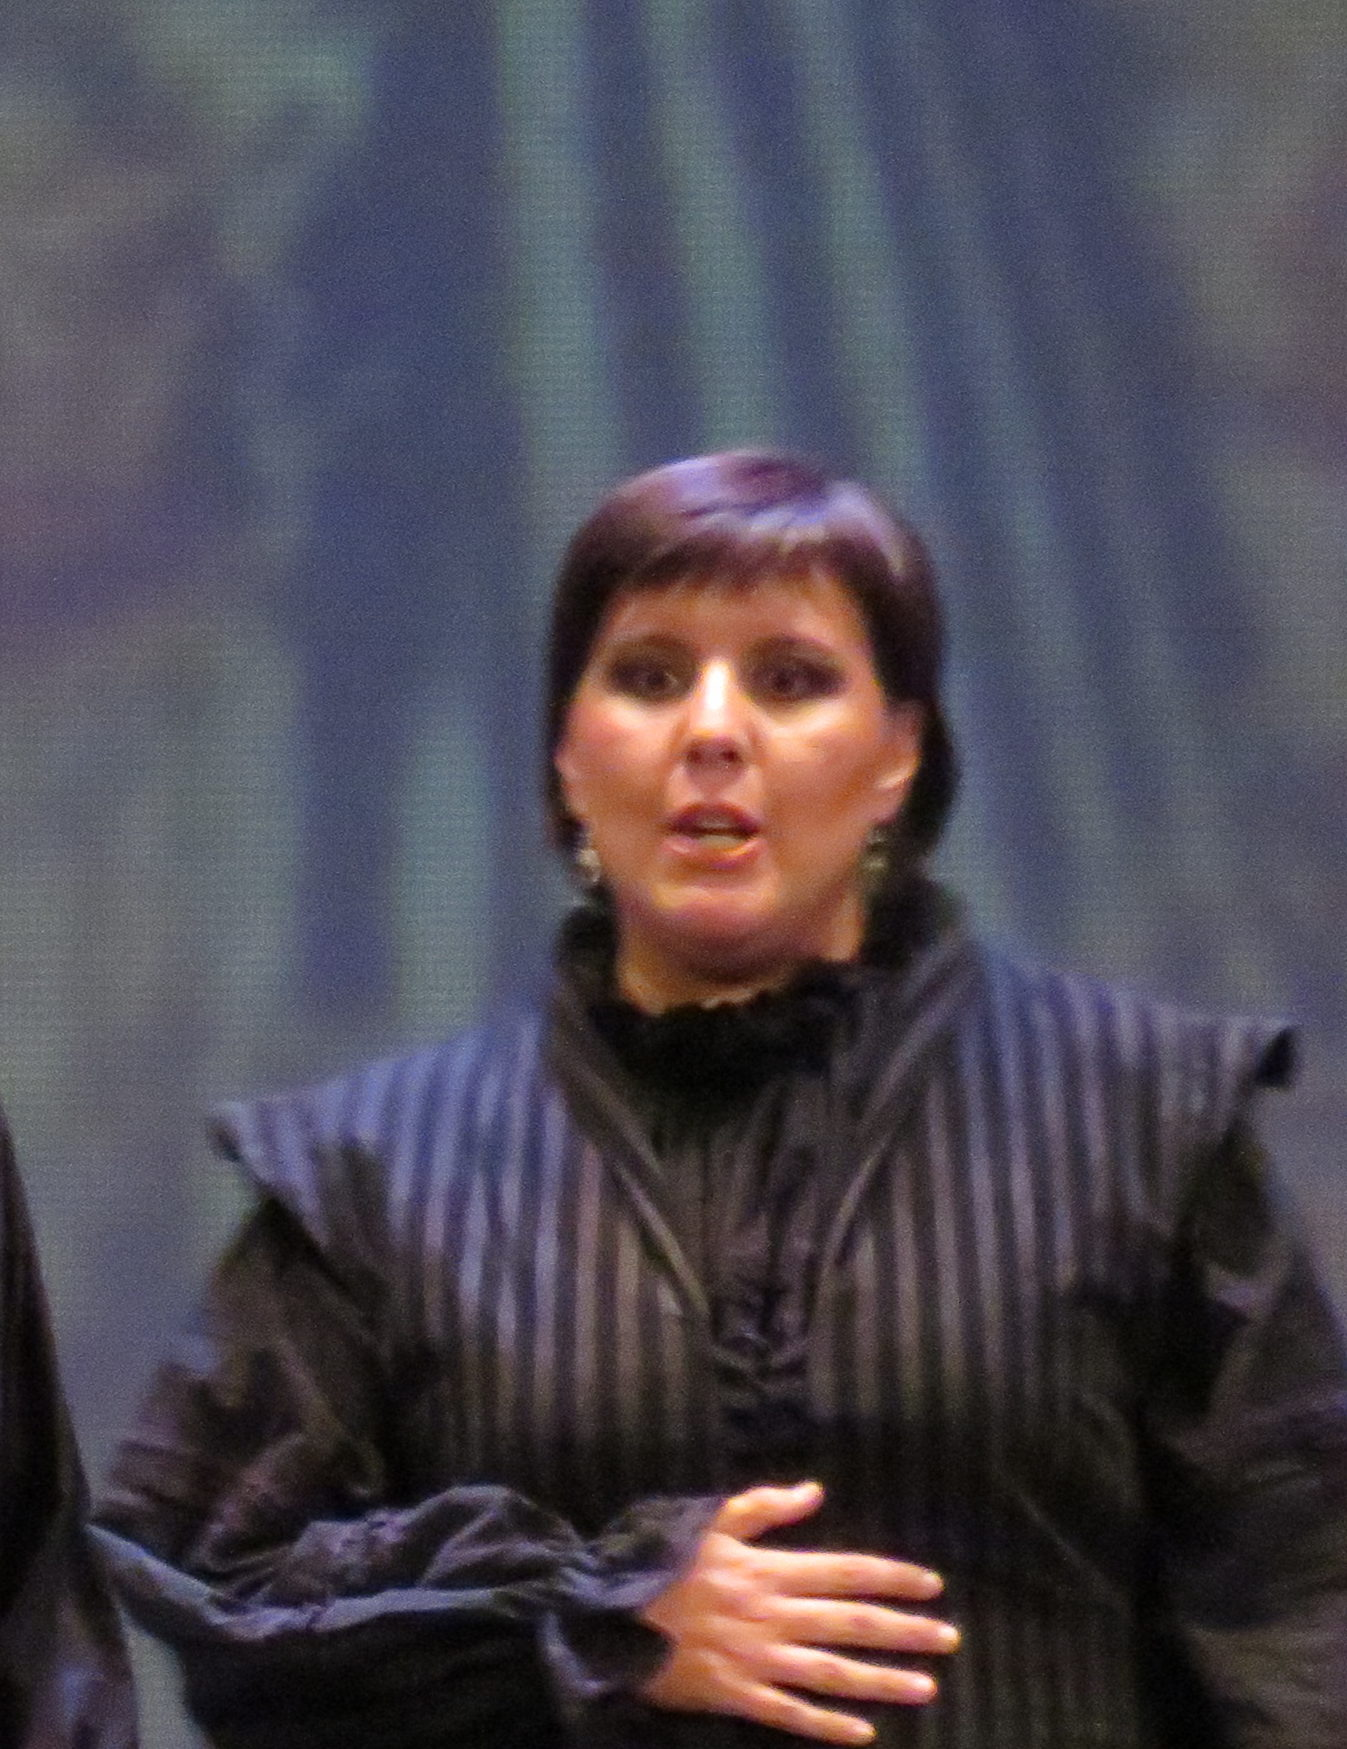 Carolina Coto